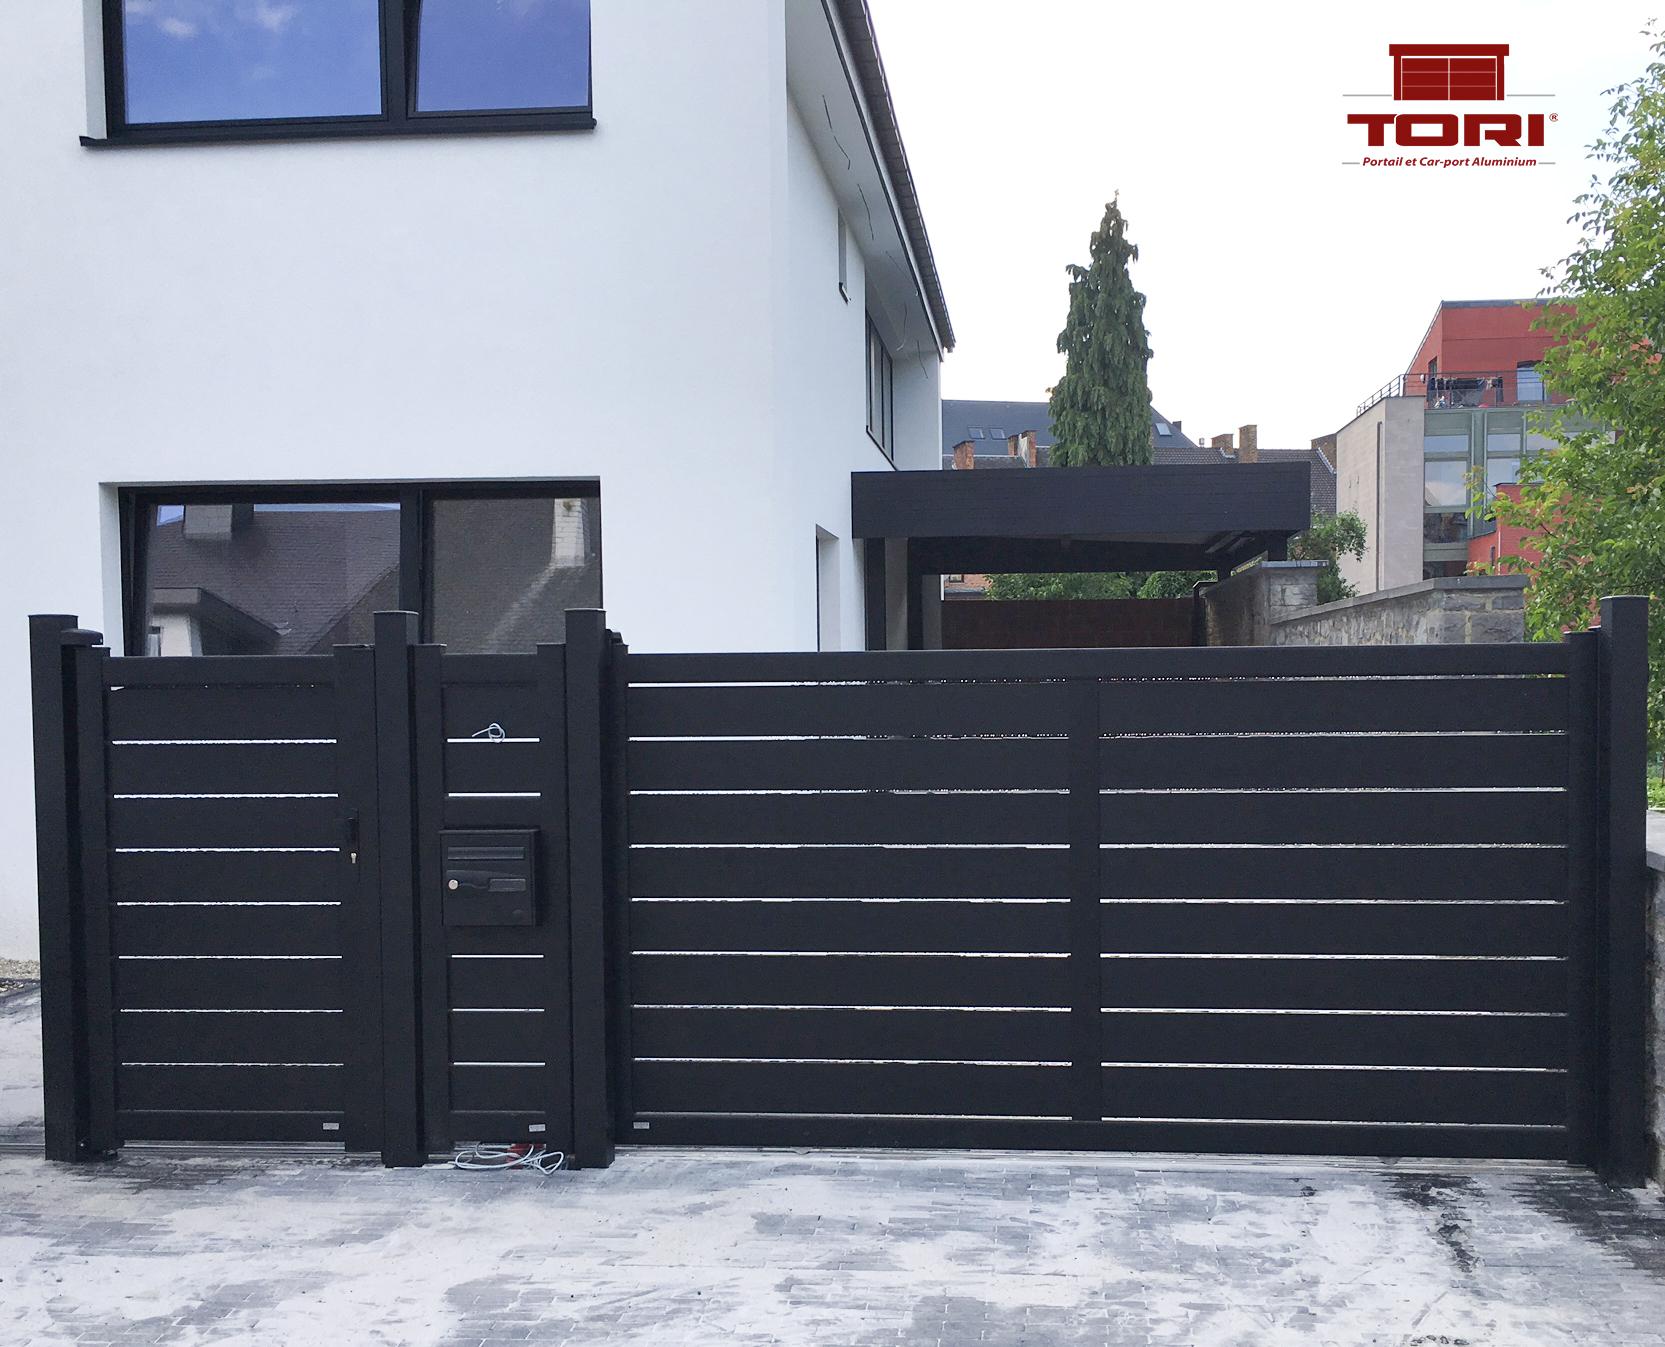 portail alu coulissant pas cher stunning portail aluminium coulissant ajour lame horizontale. Black Bedroom Furniture Sets. Home Design Ideas